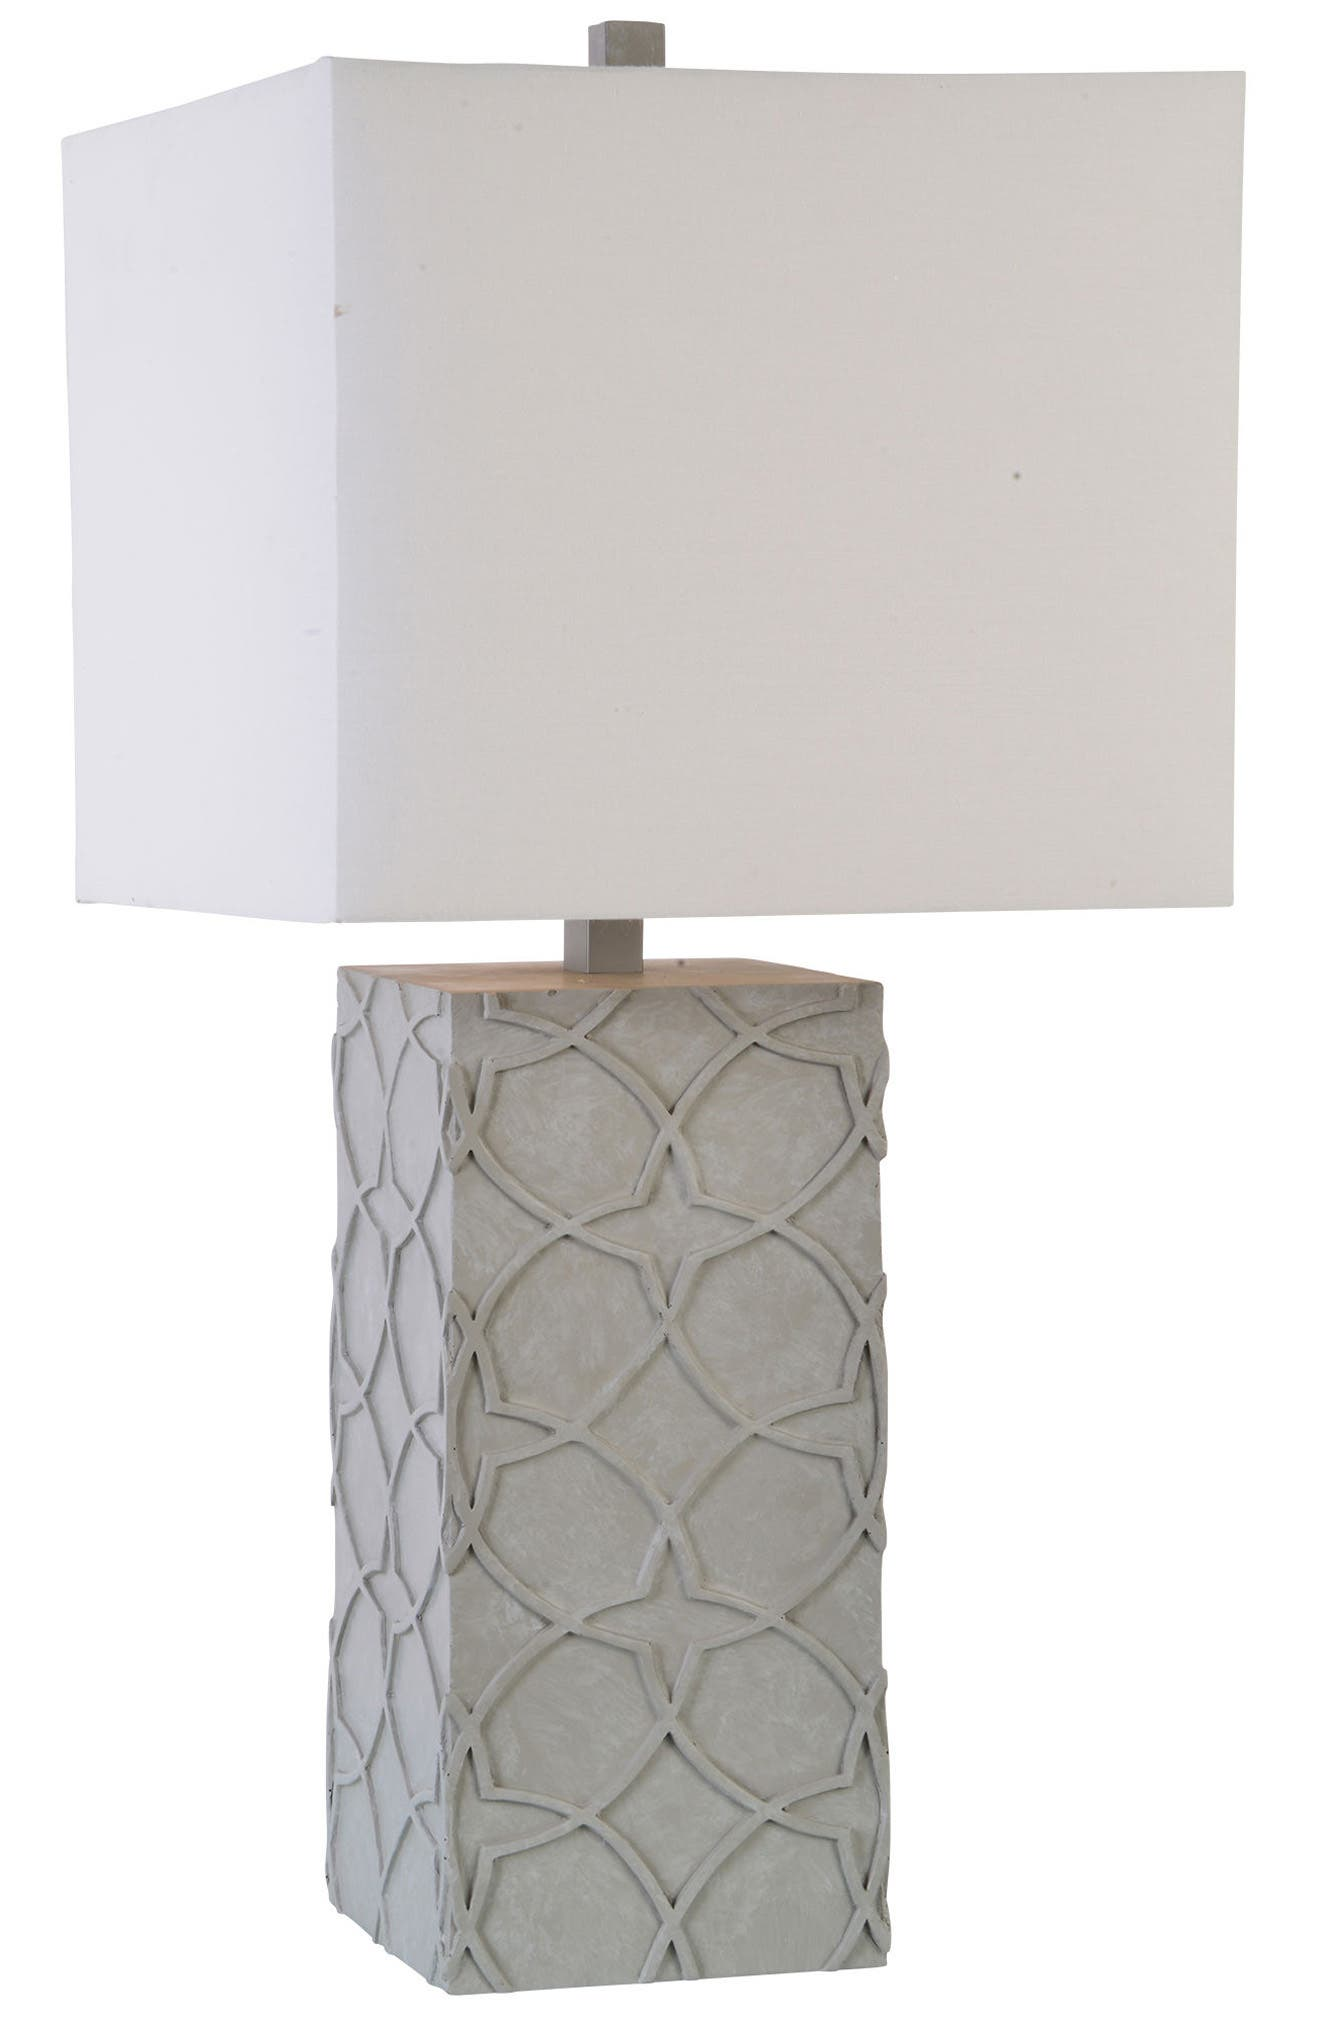 Barkly Table Lamp,                             Alternate thumbnail 3, color,                             CONCRETE